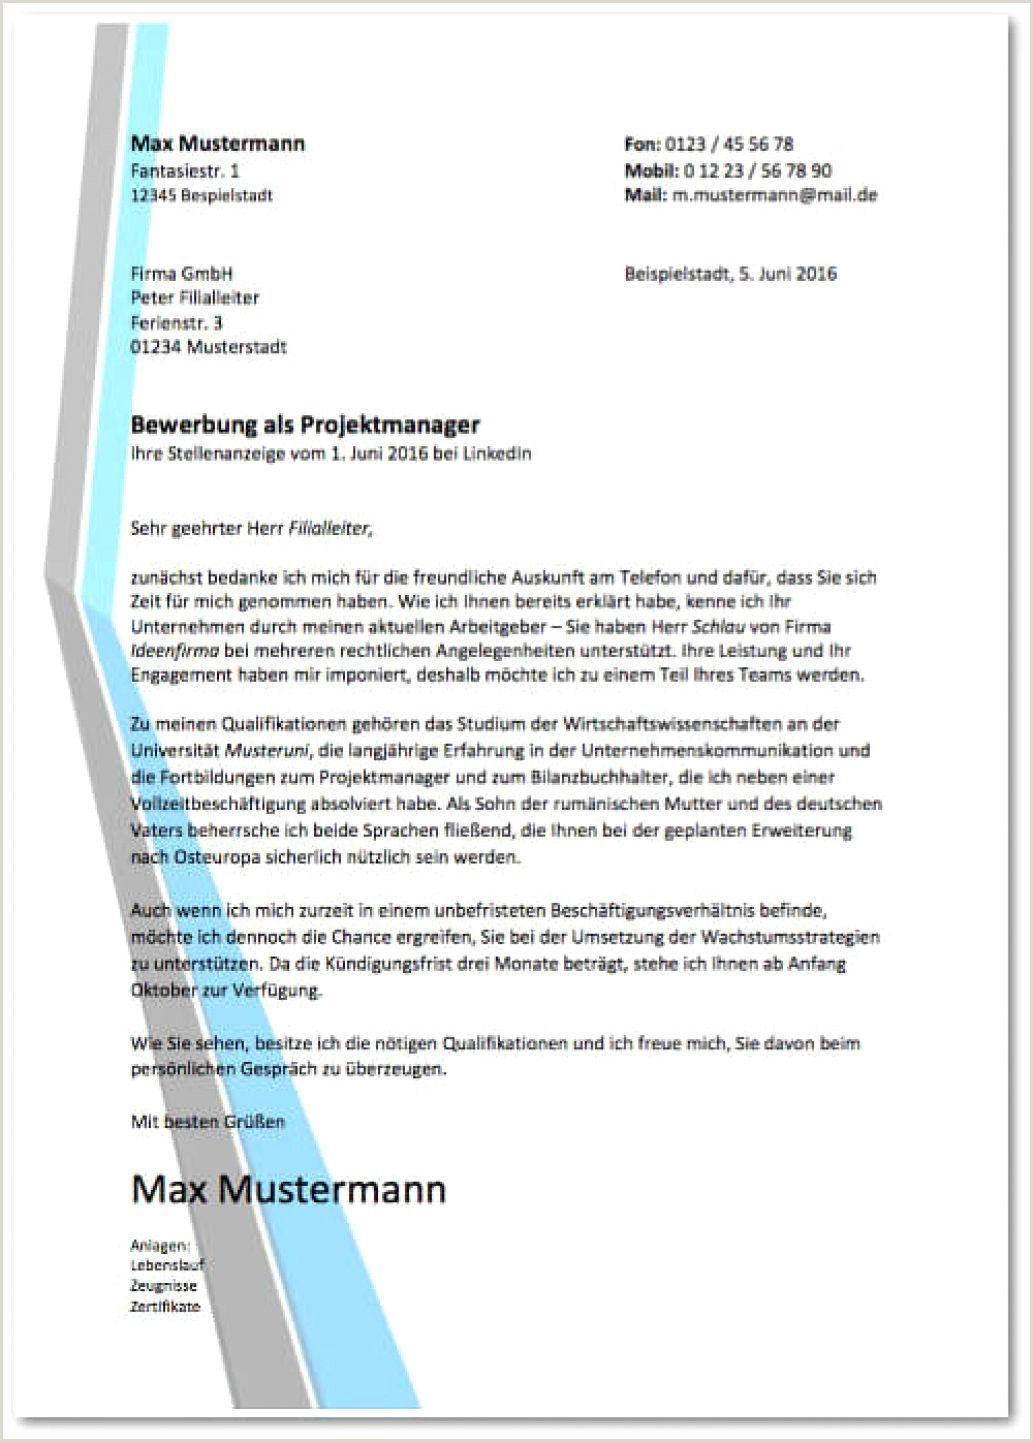 Cv Beispiel Projektmanager Resume Examples Muster Projektmanager Fortsetzen Muster Projektmanager Fortsetze In 2020 Lebenslauf Projekt Manager Lebenslauf Muster